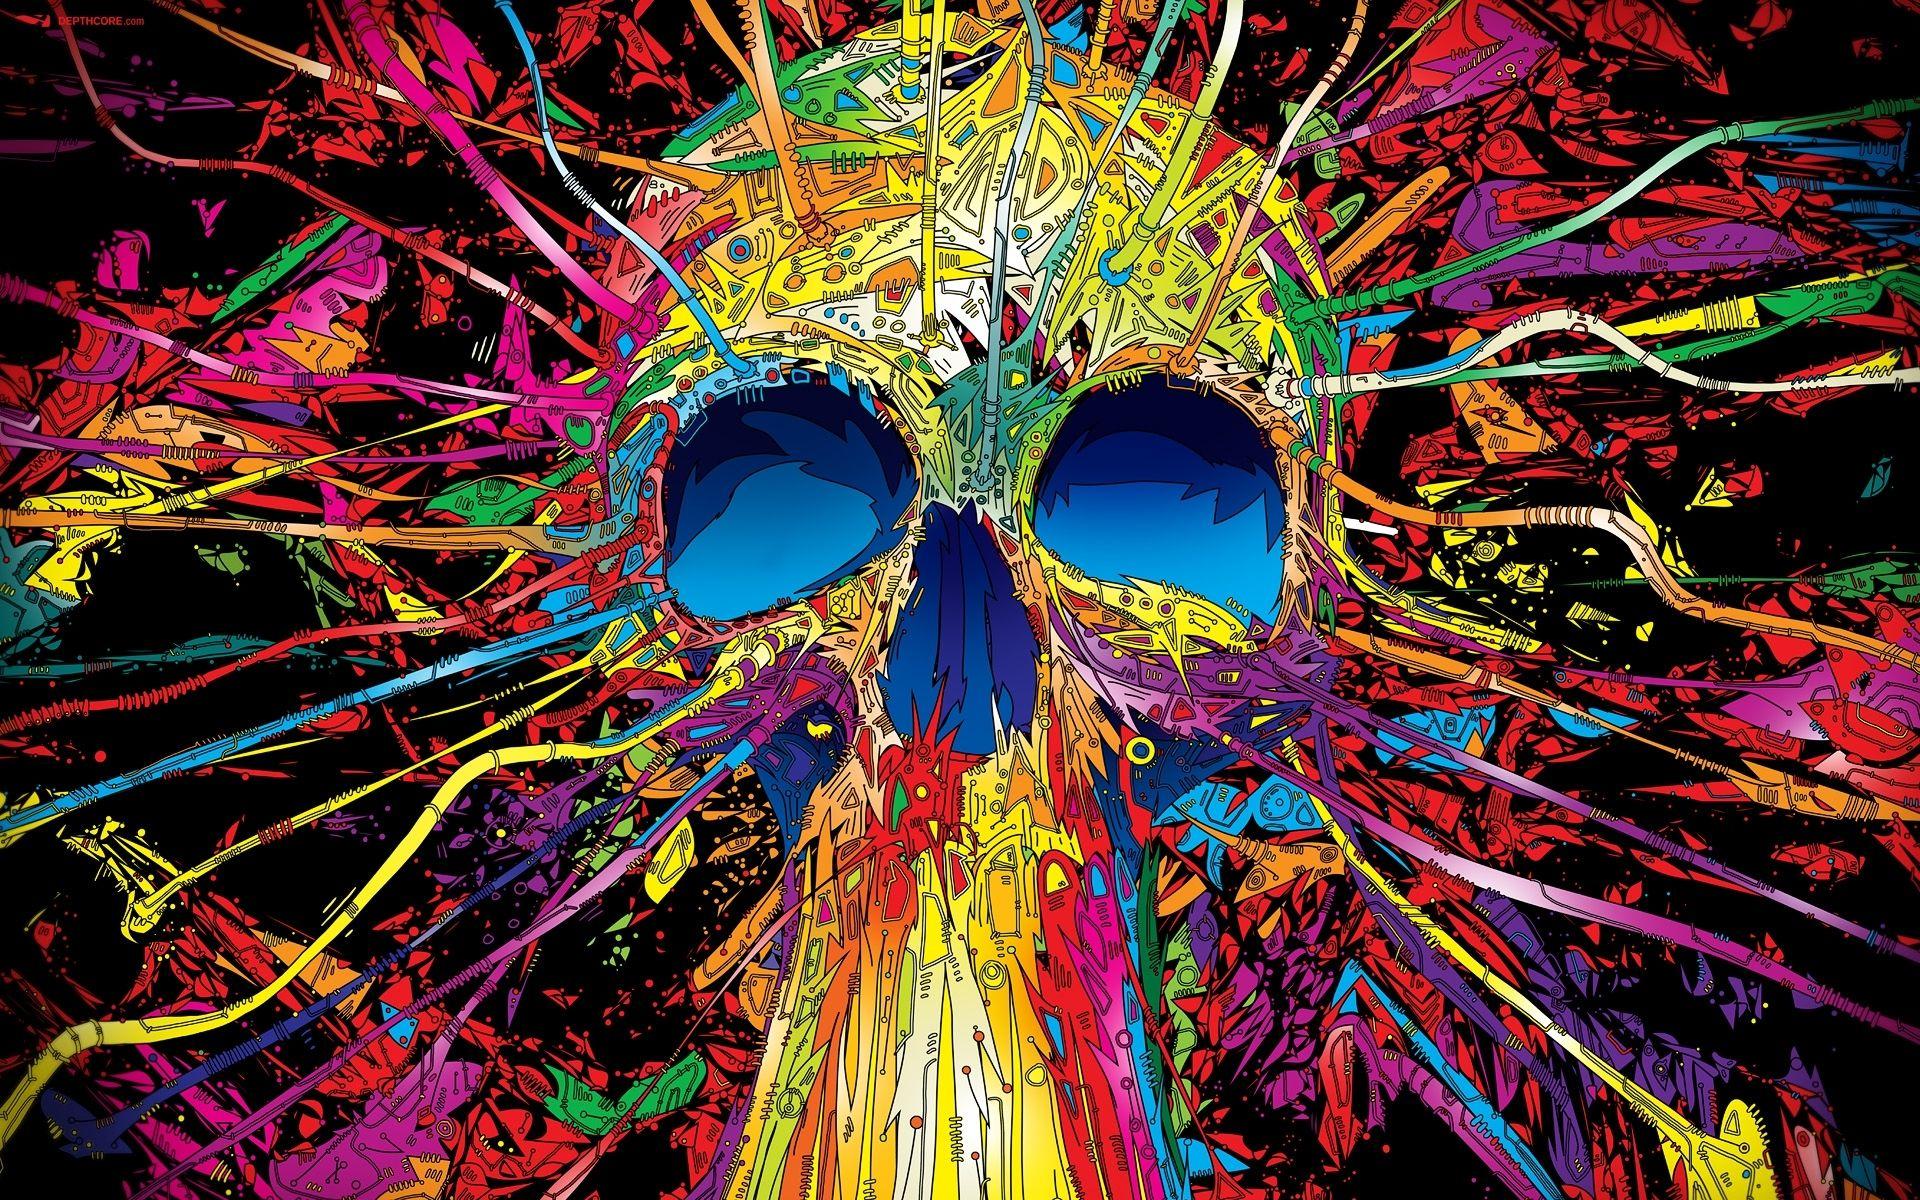 10 Latest Wallpapers Full Hd Colores Full Hd 1080p For Pc Desktop Skull Wallpaper Artistic Wallpaper Skull Art